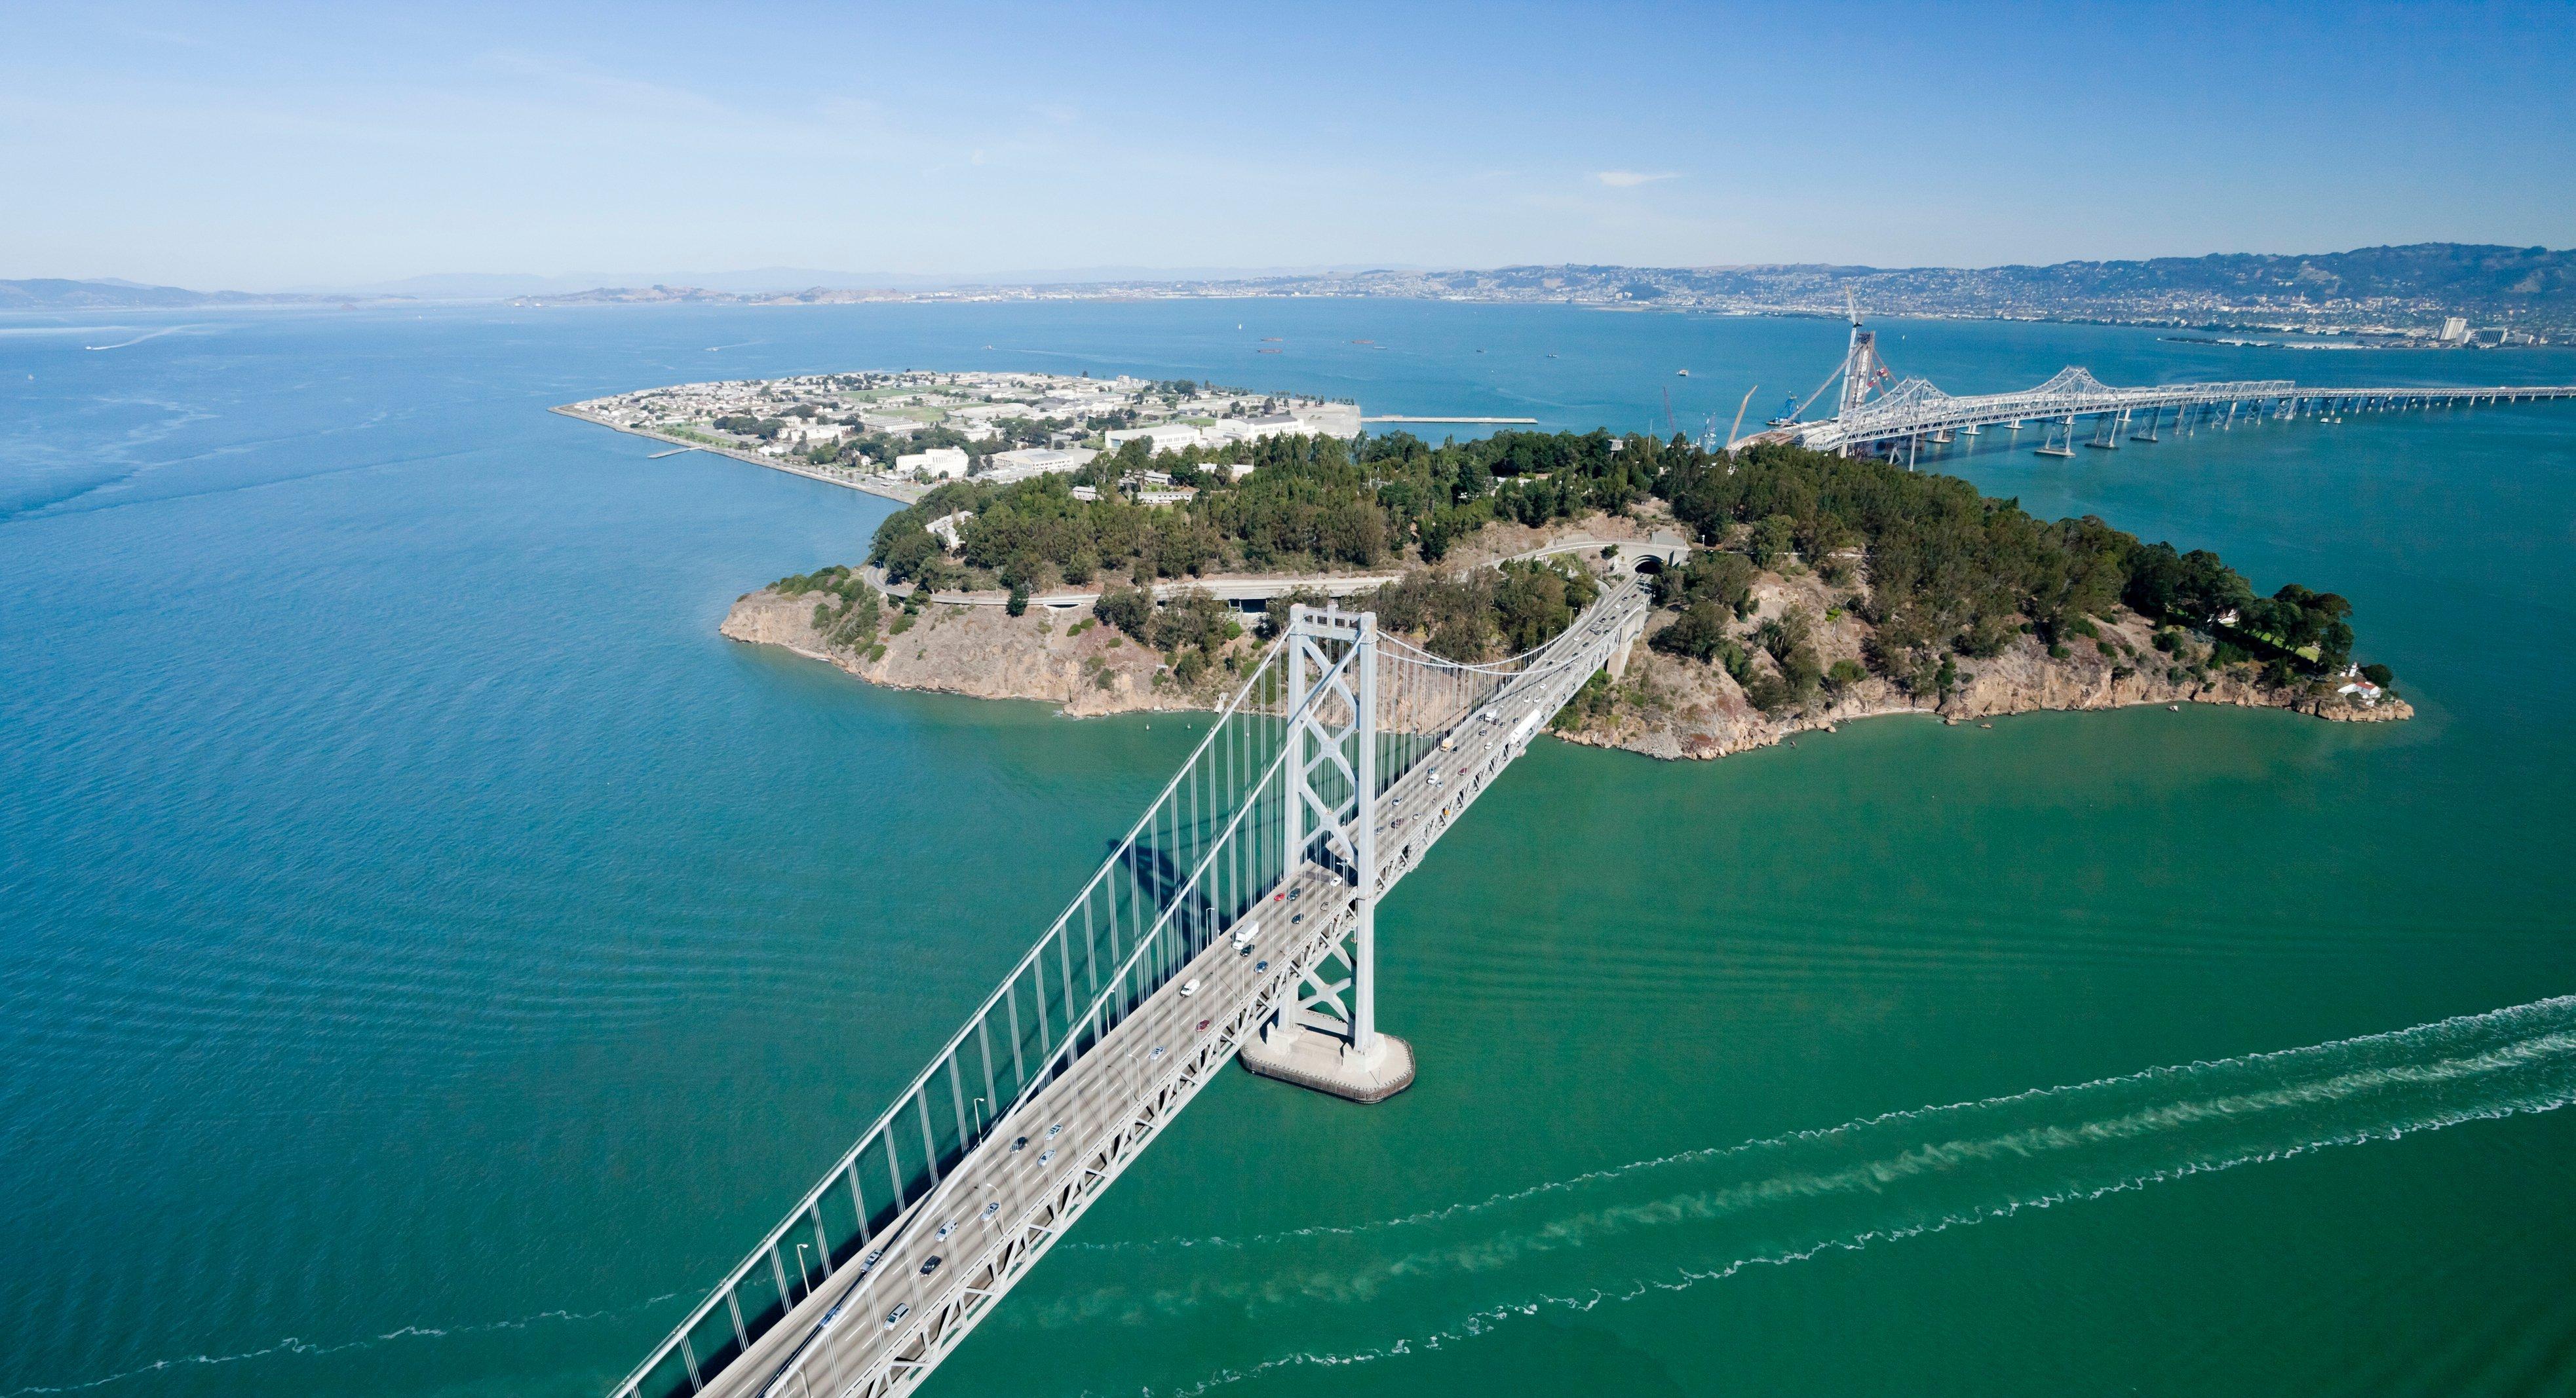 San Francisco Bay bridge aerial view w Treasure Island